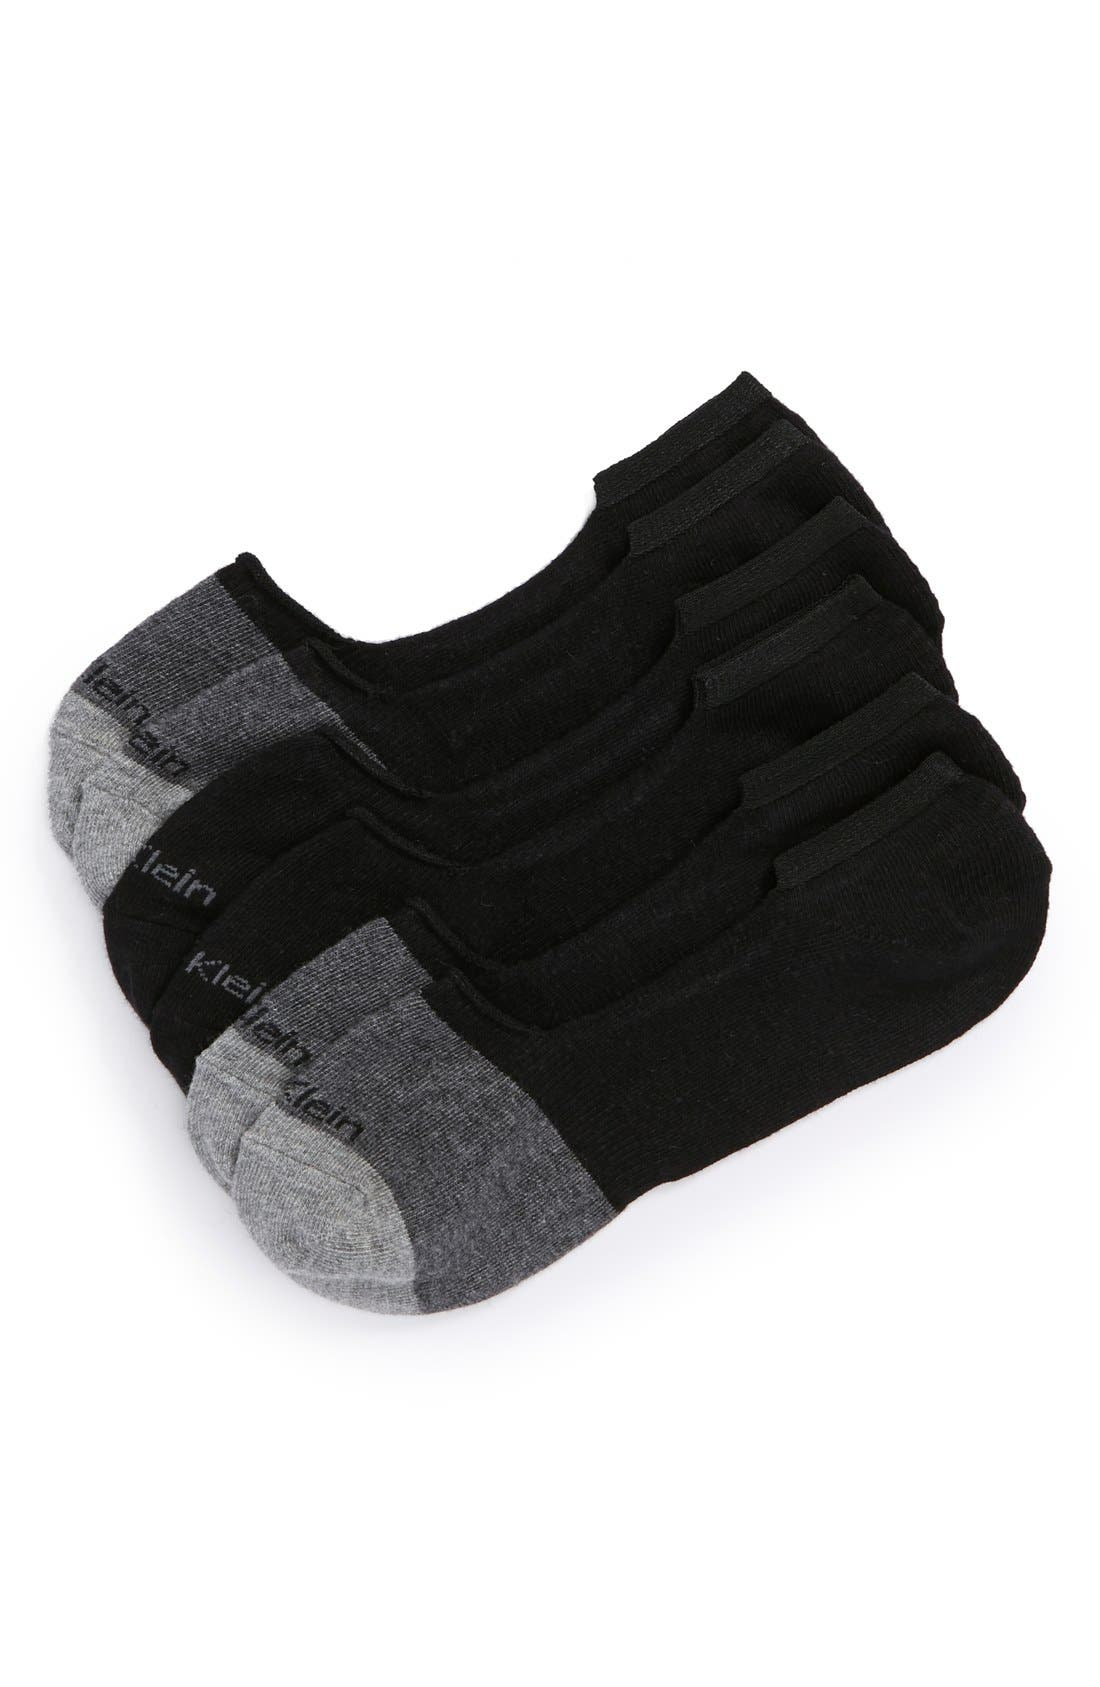 Alternate Image 1 Selected - Calvin Klein 3-Pack No-Show Socks